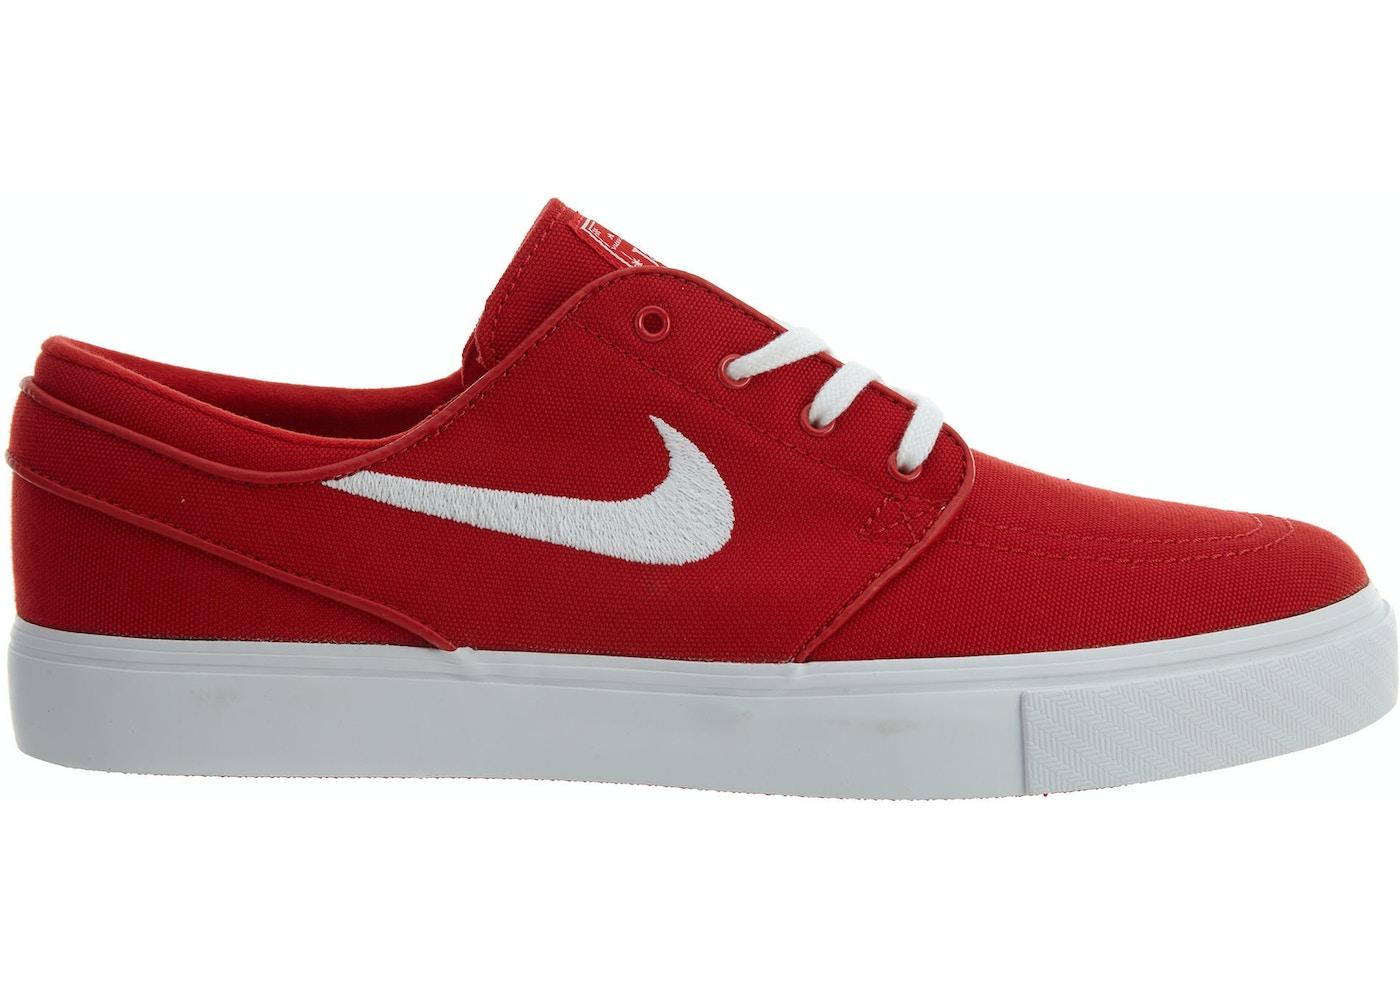 371fbd21e472 Sell. or Ask. Size --. View All Bids. Nike Zoom Stefan Janoski Cnvs  University ...